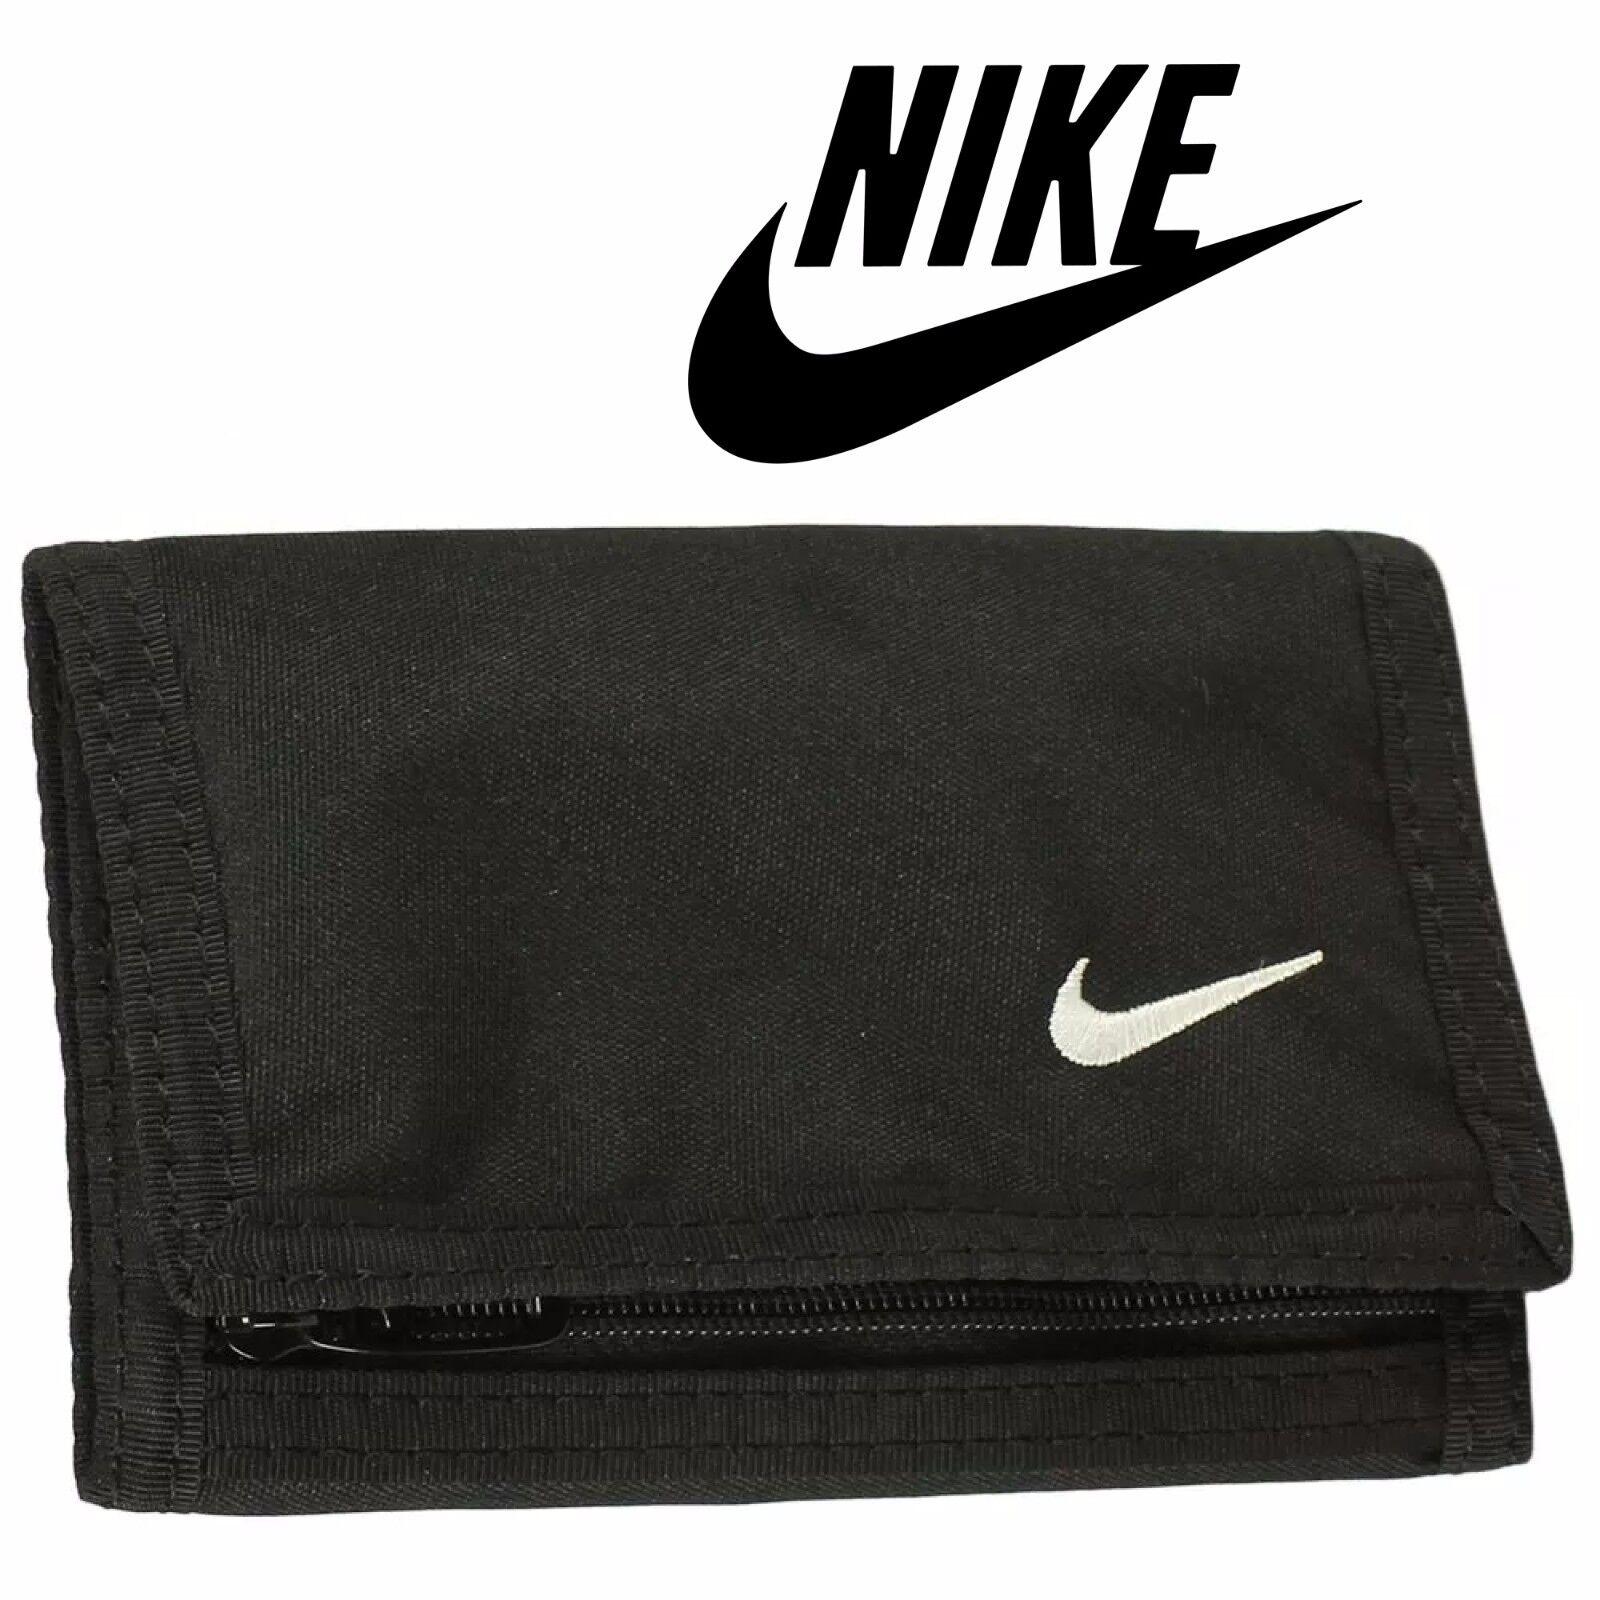 Nike Portemonnaie